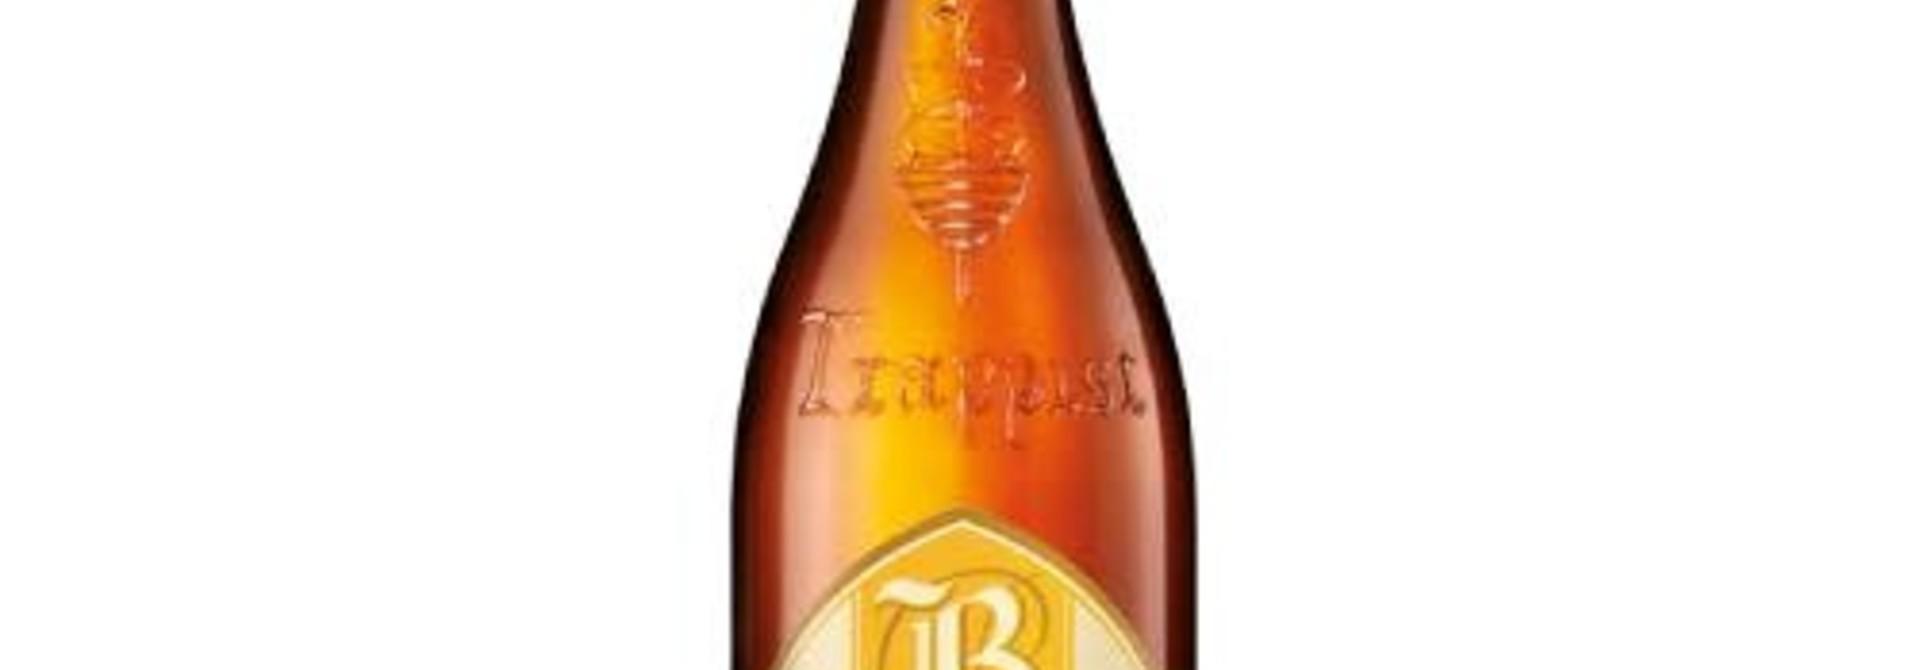 LA TRAPPE BLOND 75CL